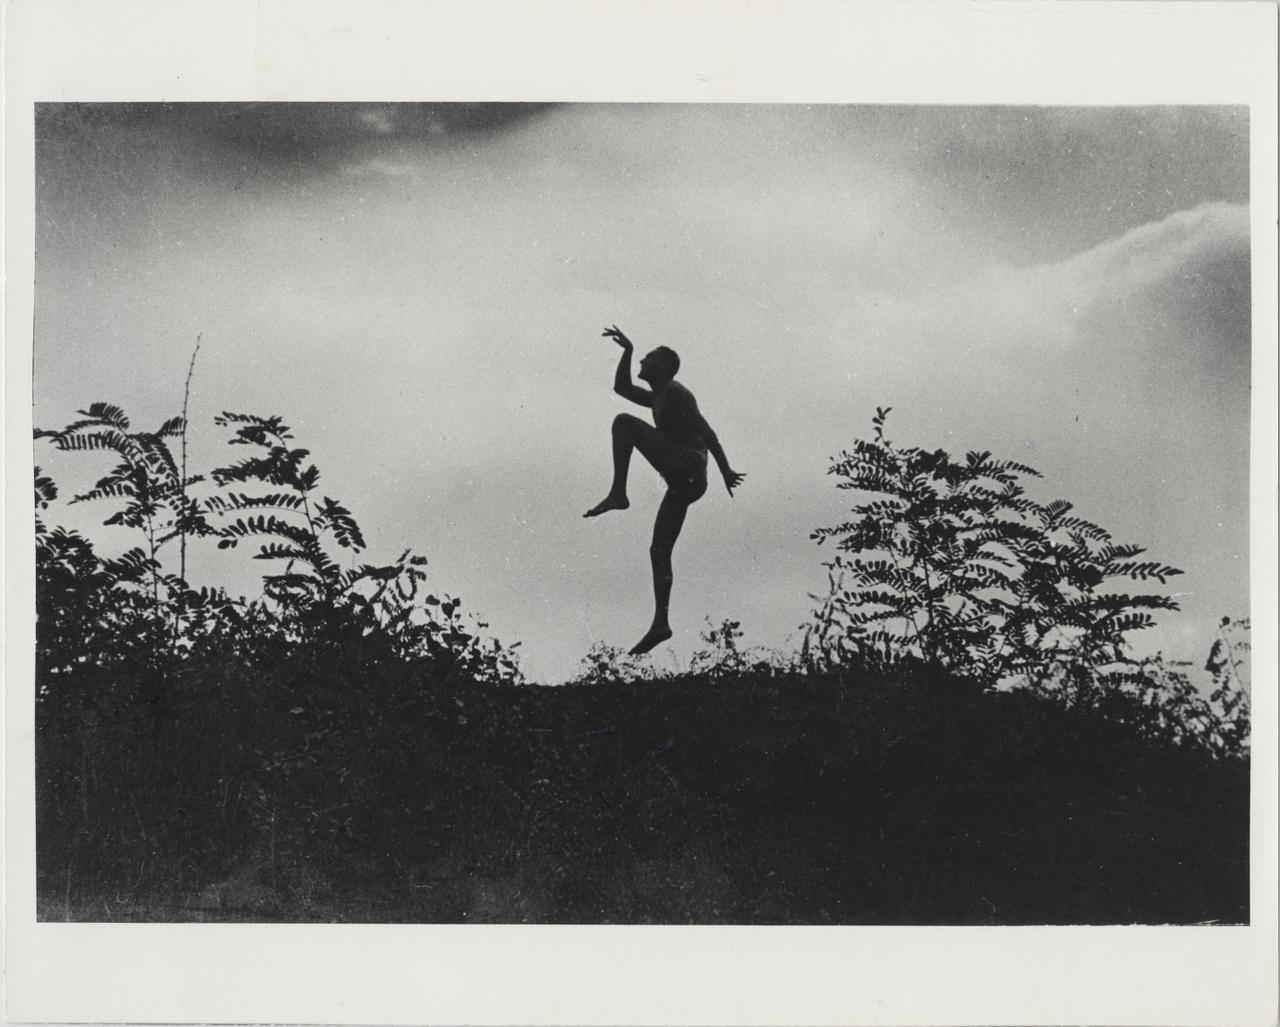 Szabadban táncoló férfi, Dunaharaszti 1919. június